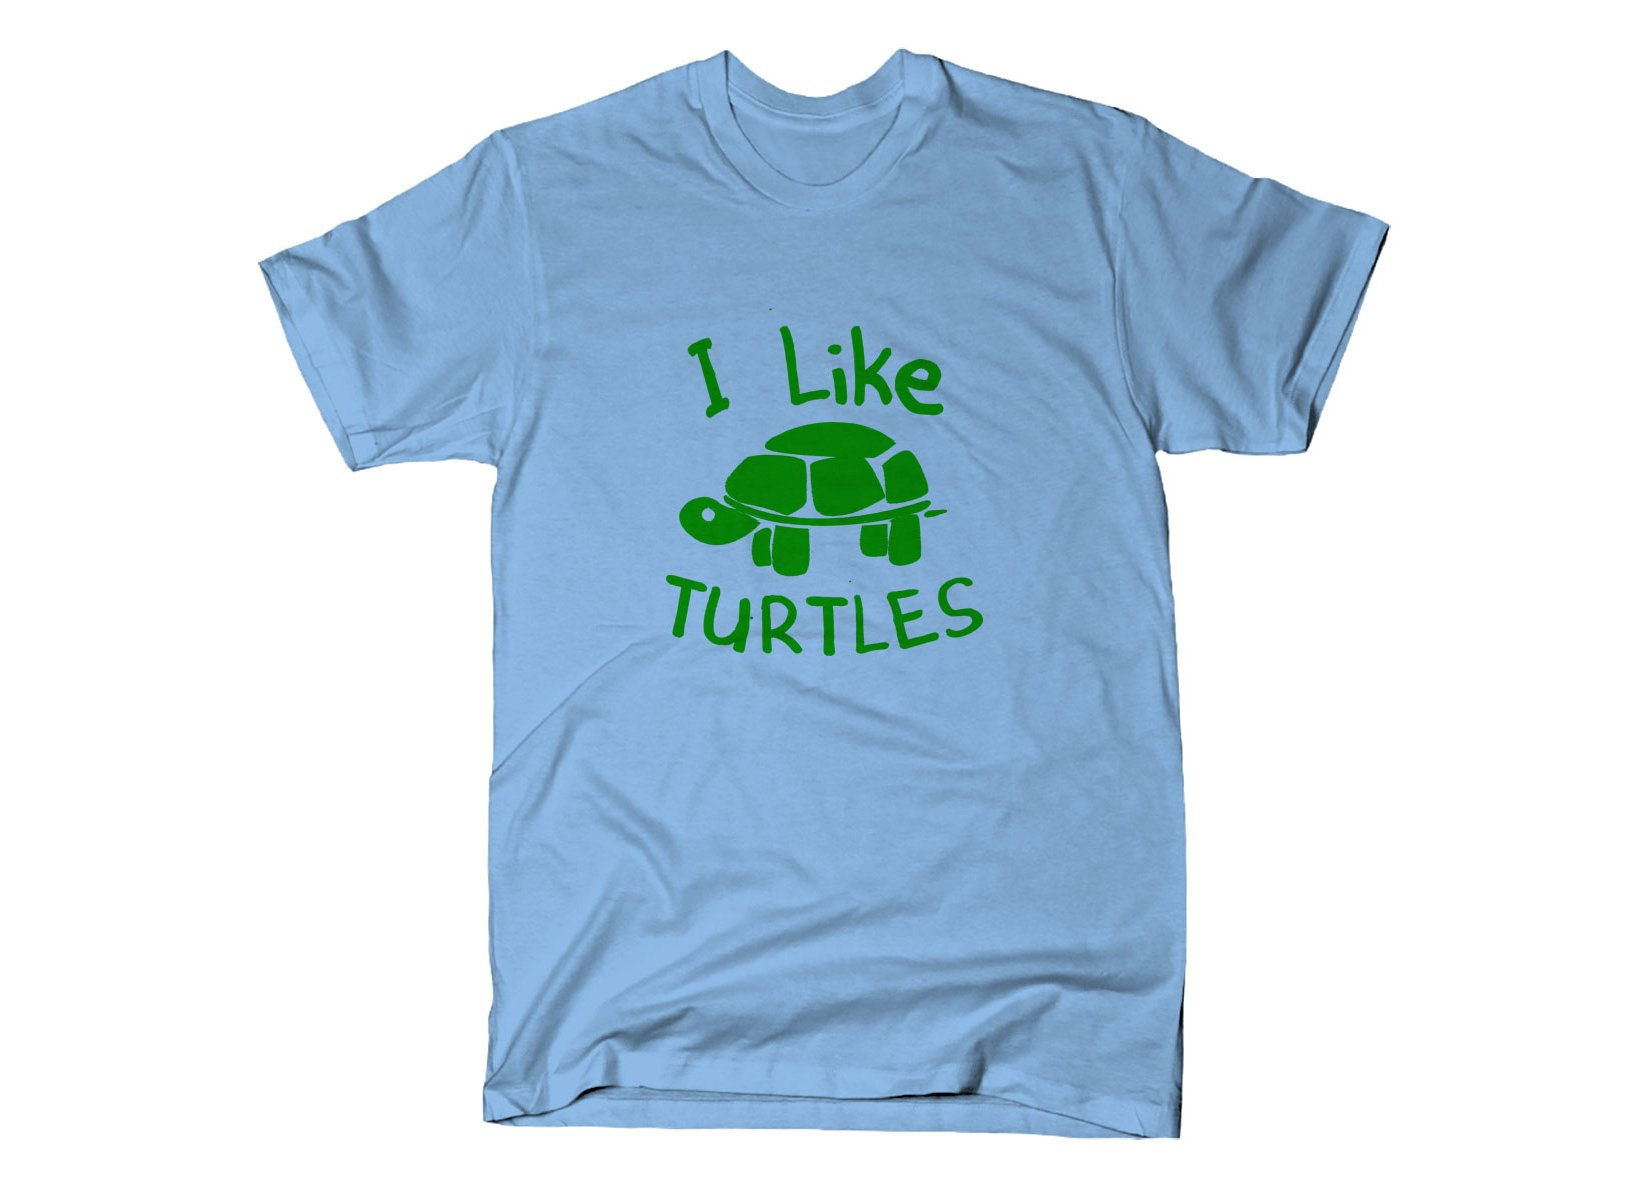 I Like Turtles on Mens T-Shirt